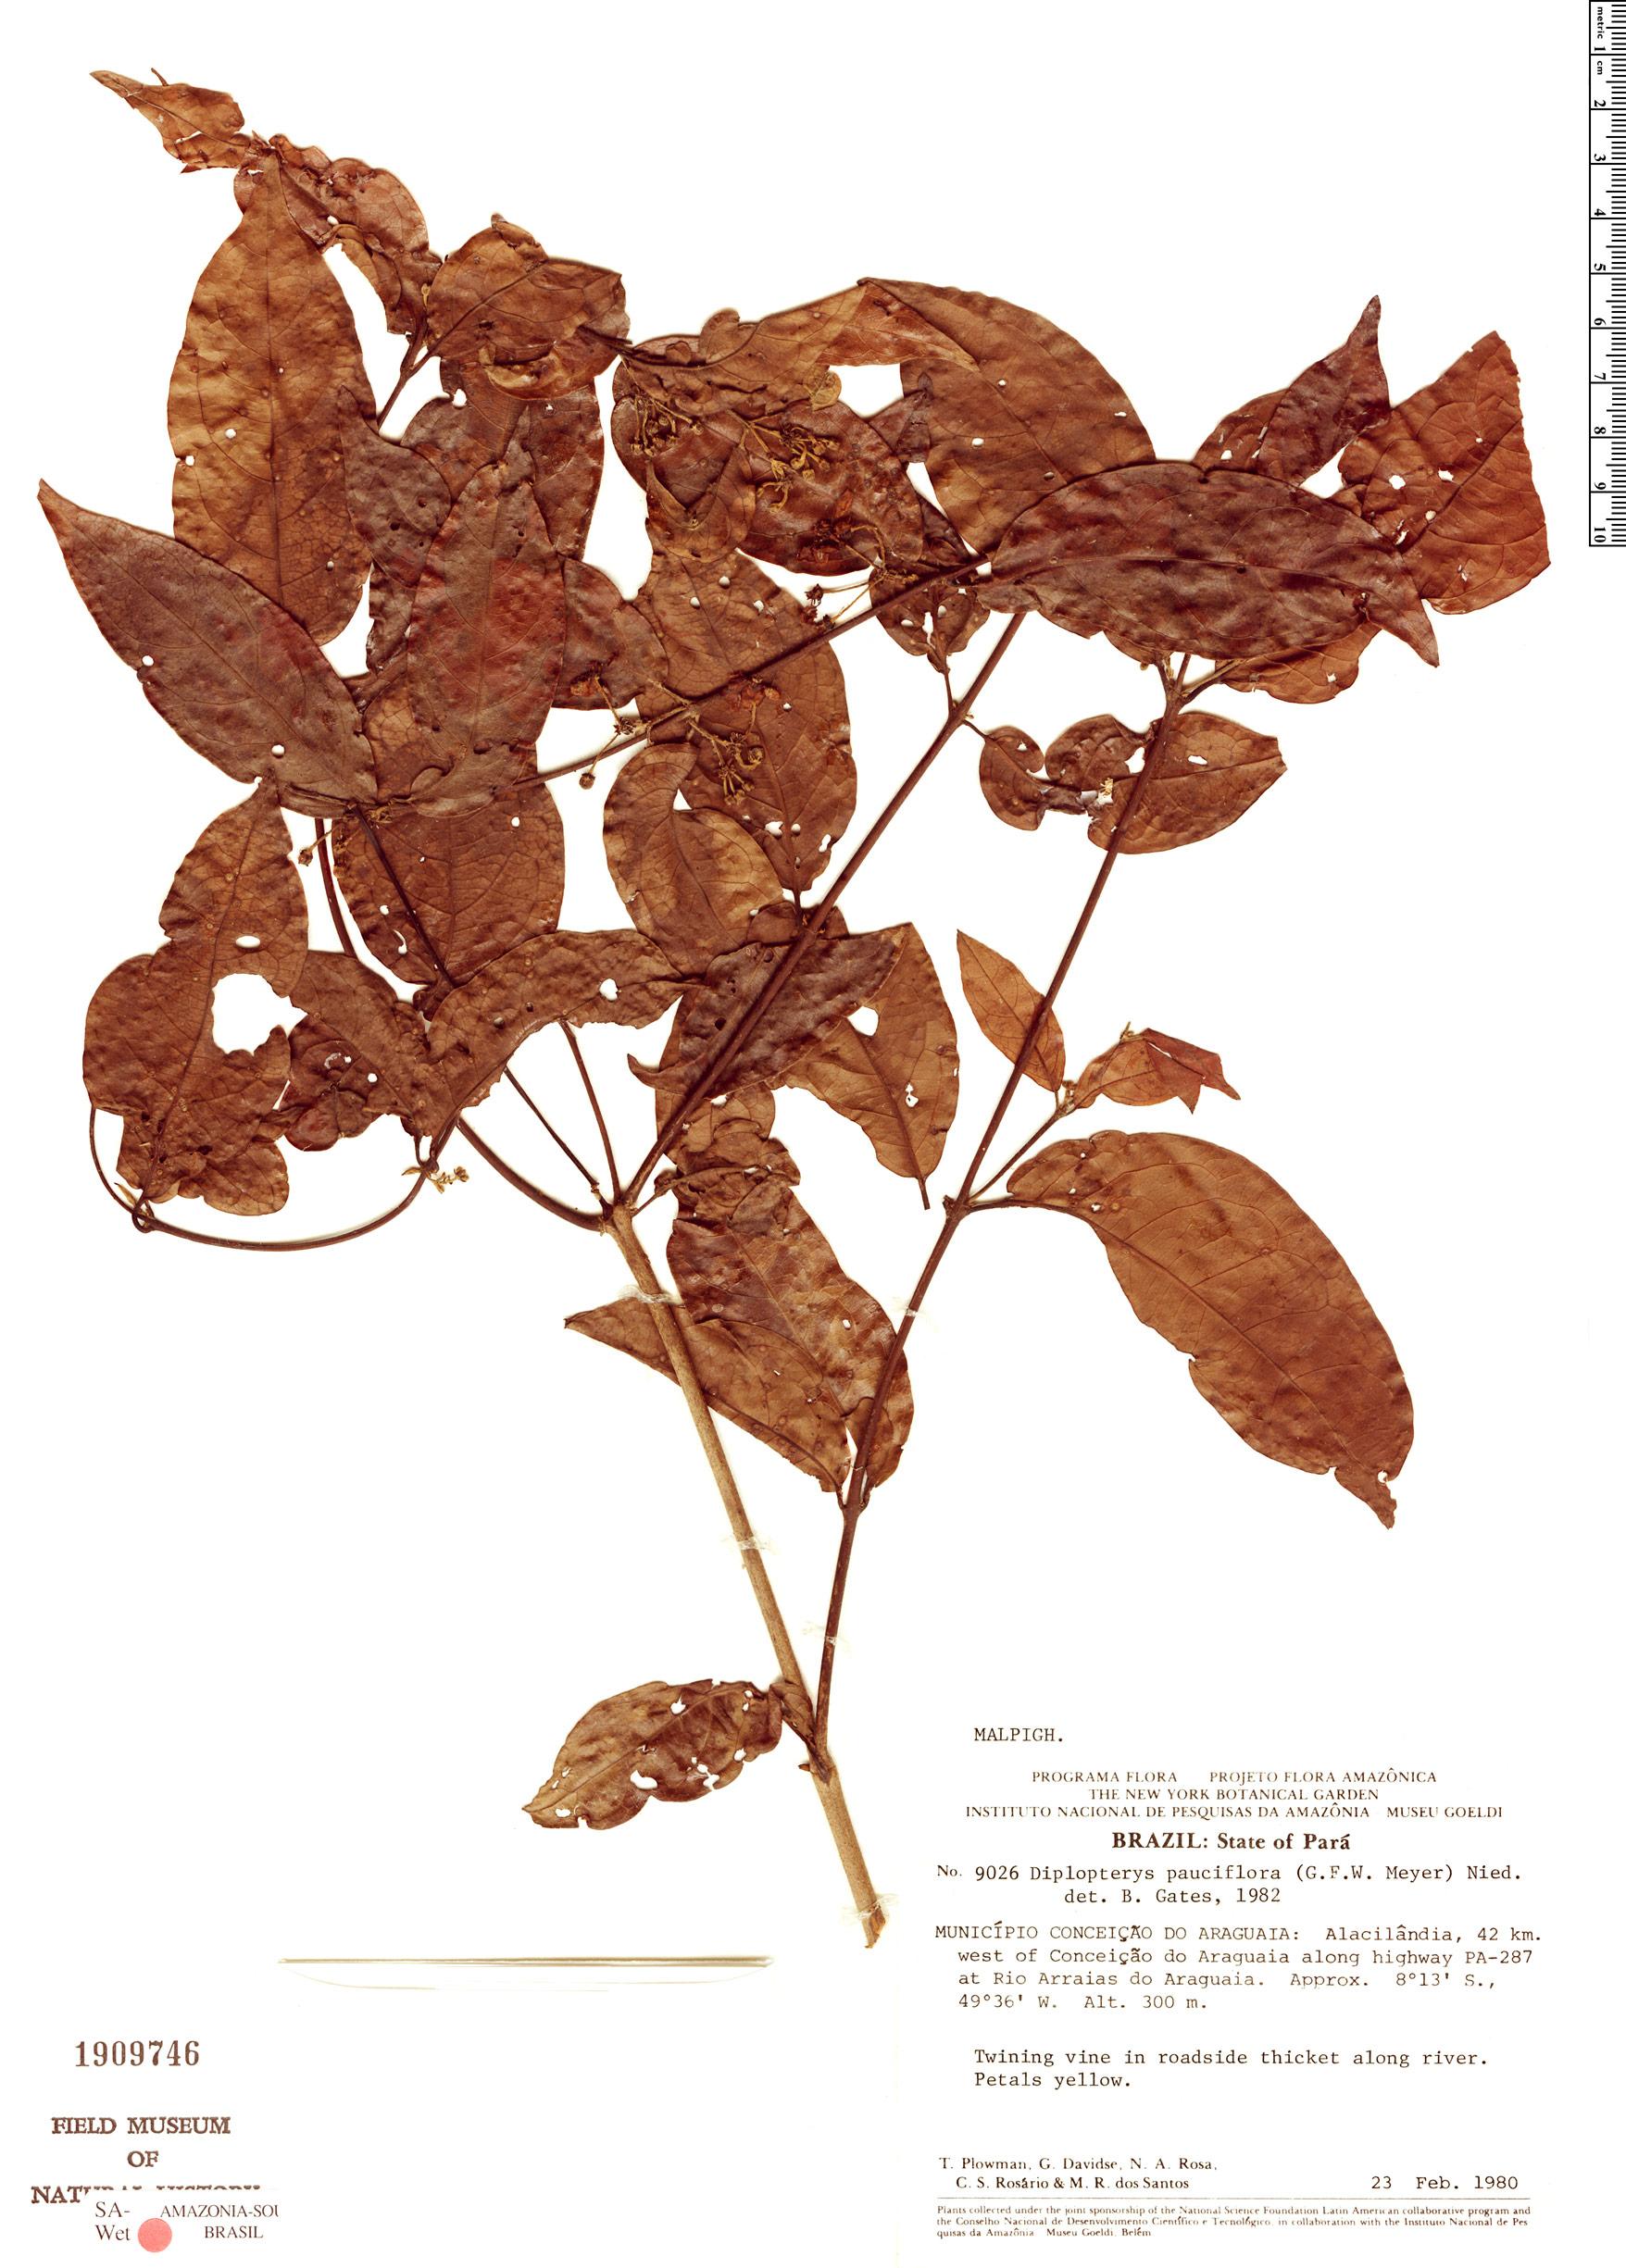 Espécimen: Diplopterys pauciflora